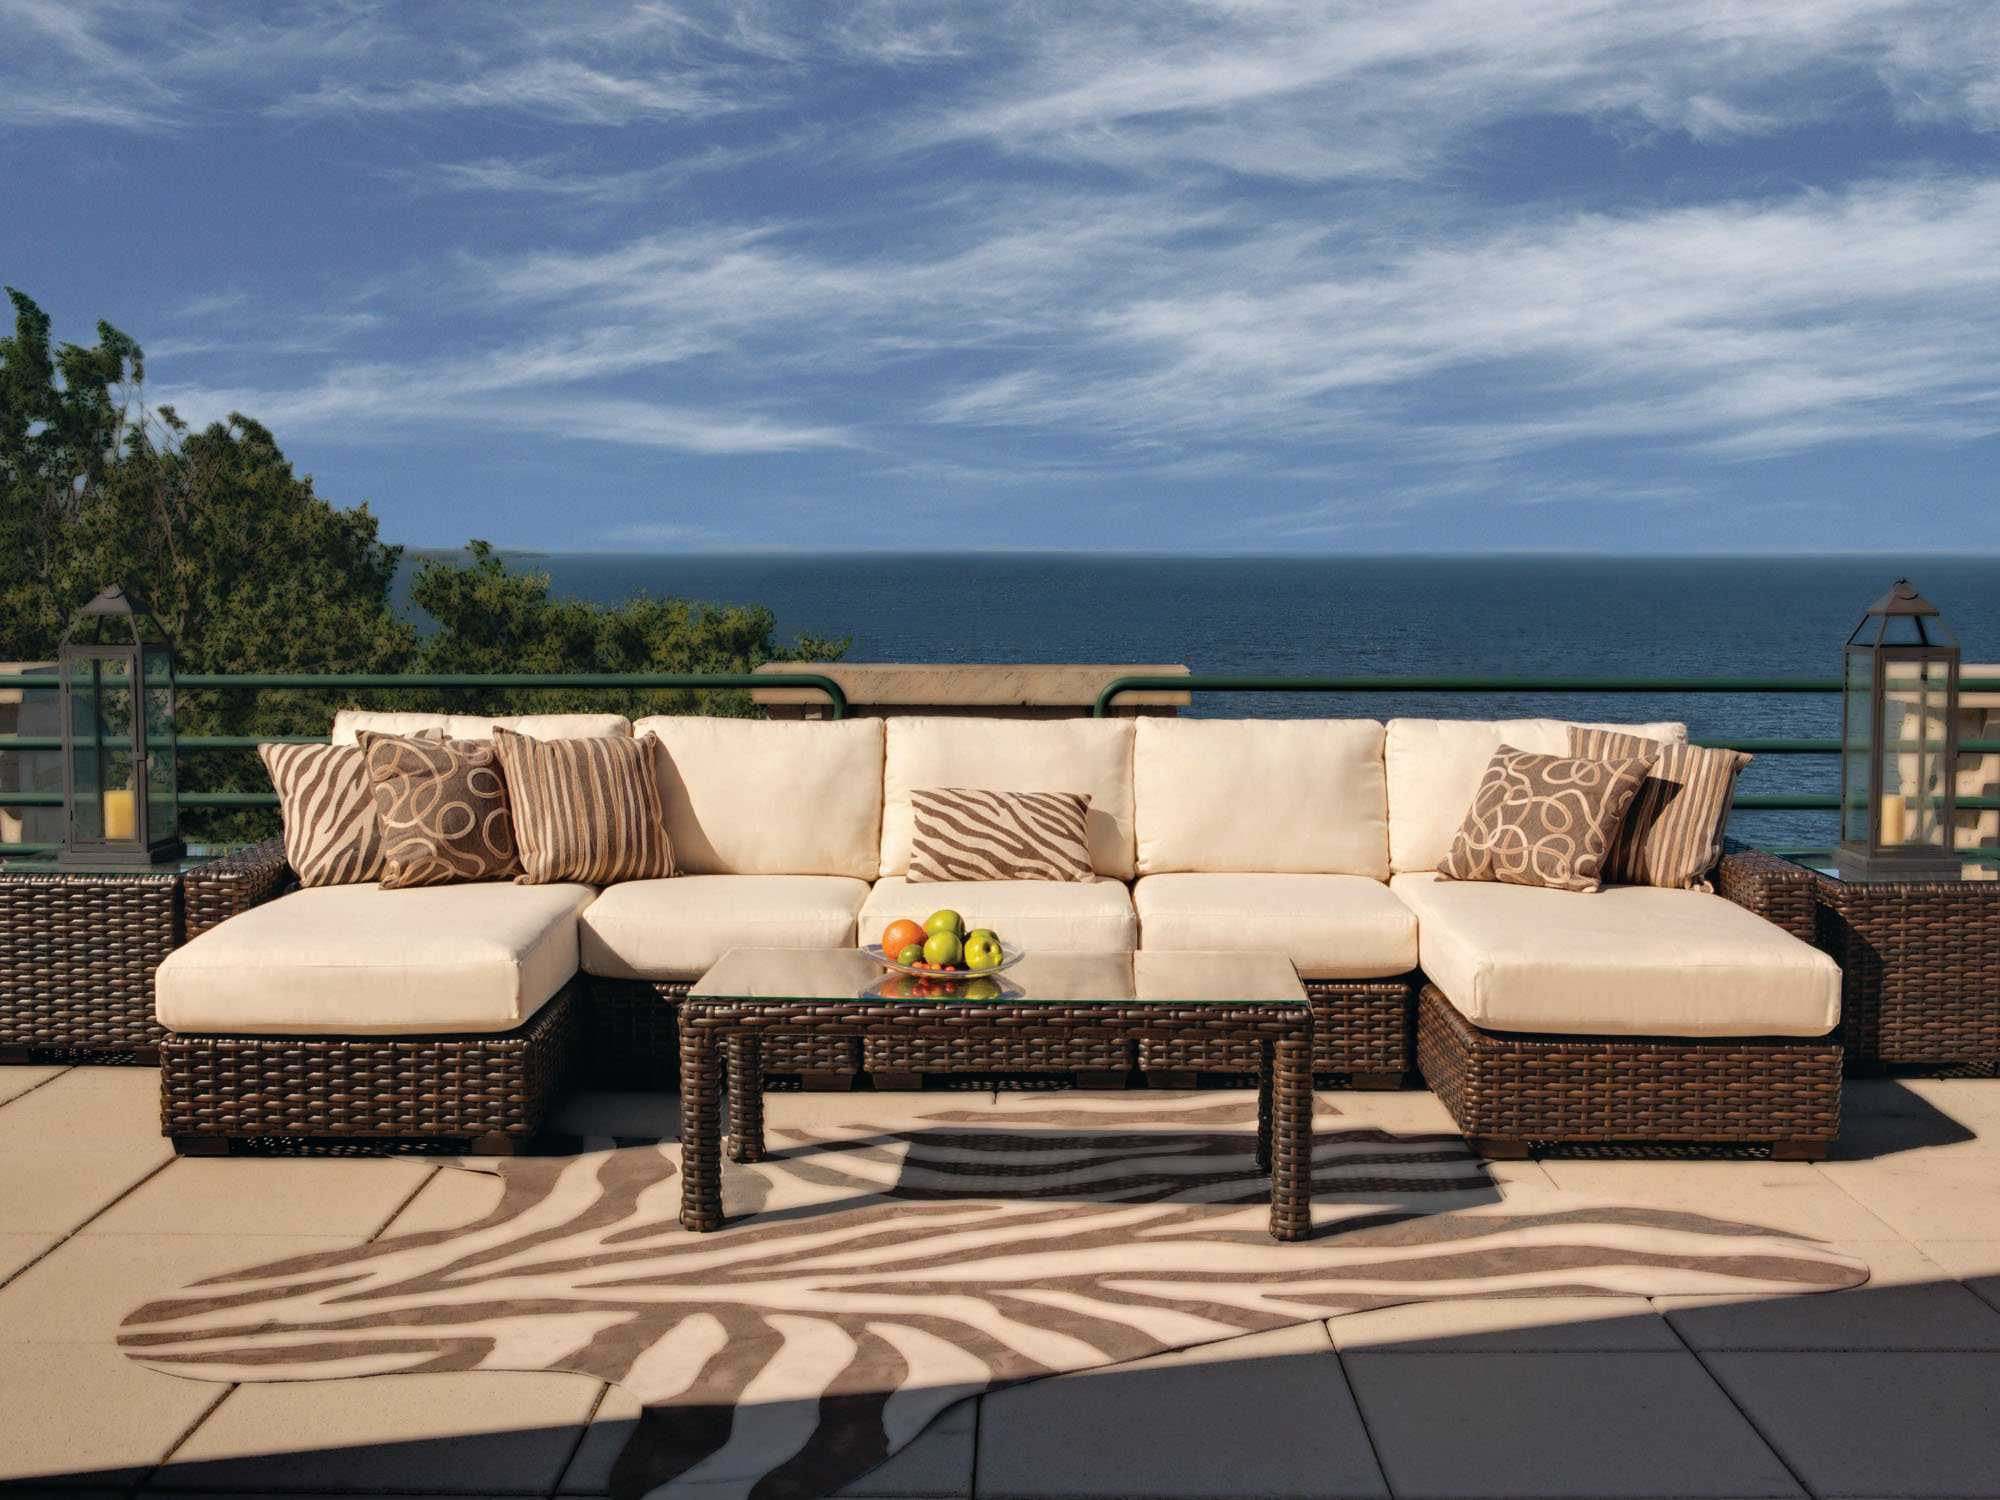 Lloyd flanders contempo wicker side lounge chair 38053 - Contempo wicker outdoor furniture ...